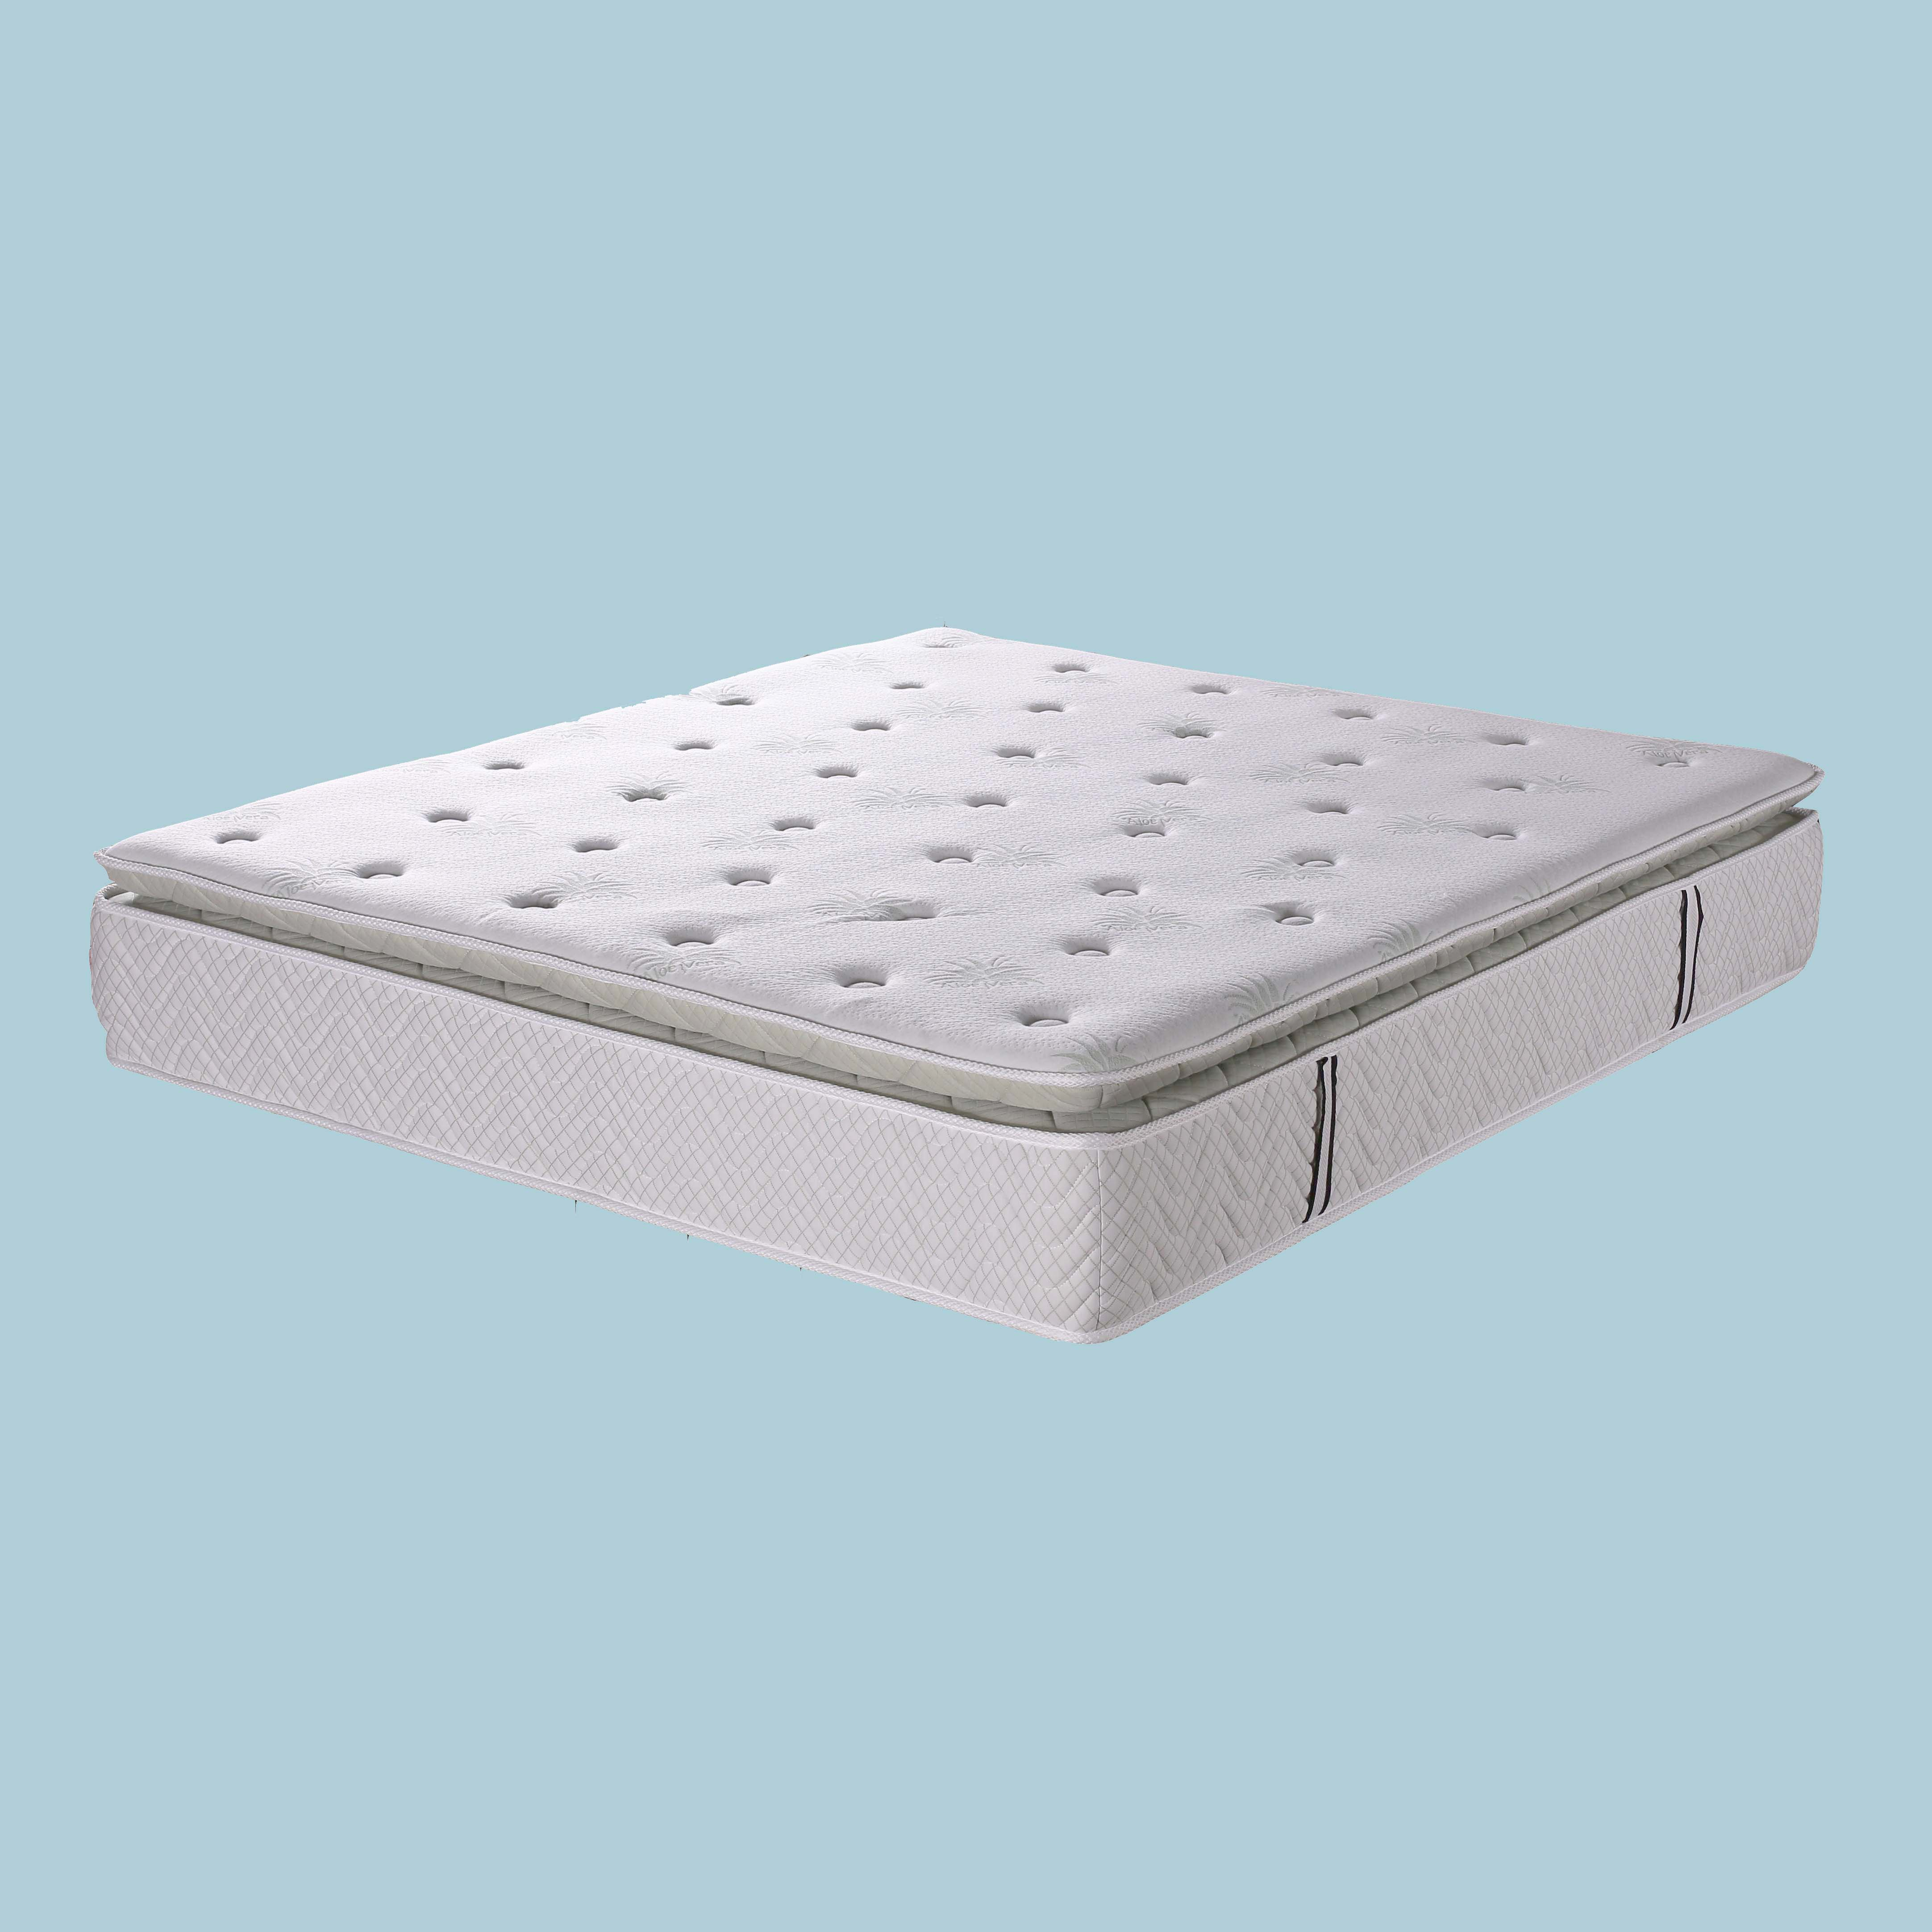 Luxury 5 star Hotel mattress pocket spring mattresses soft and comfortable gel memory foam matelas - Jozy Mattress | Jozy.net